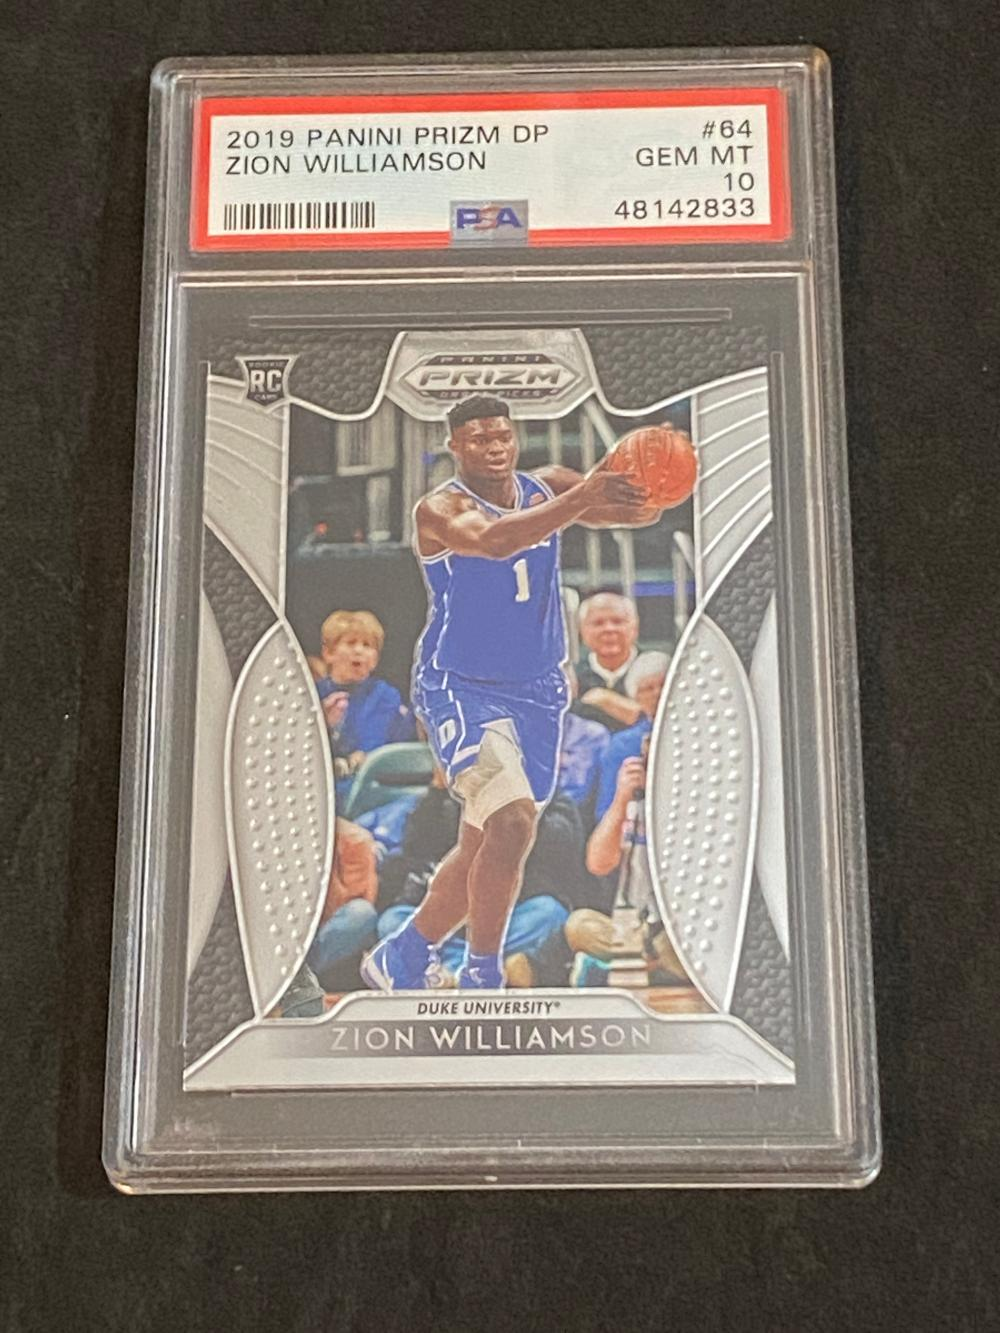 PSA 10 (Gem Mint) 2019-20 Panini Prizm Draft Picks RC Zion Williamson Rookie #64 Basketball Card